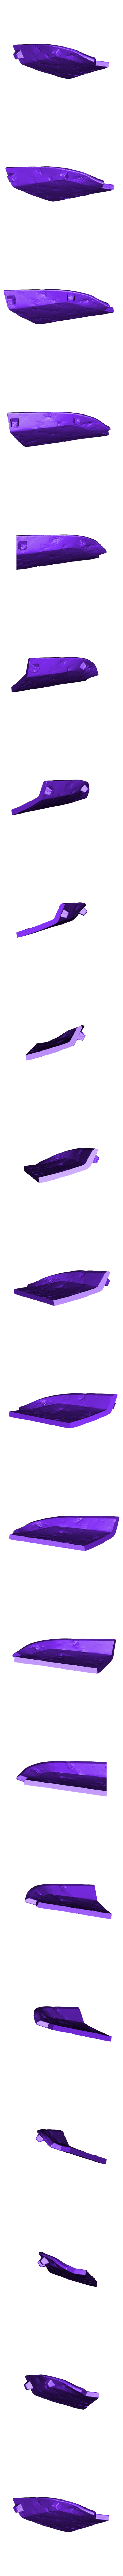 Armory_Damaged_Print18.obj Download OBJ file Armory - Knights of Ren Helmet (damaged), 3D print model • 3D print design, 3D-mon